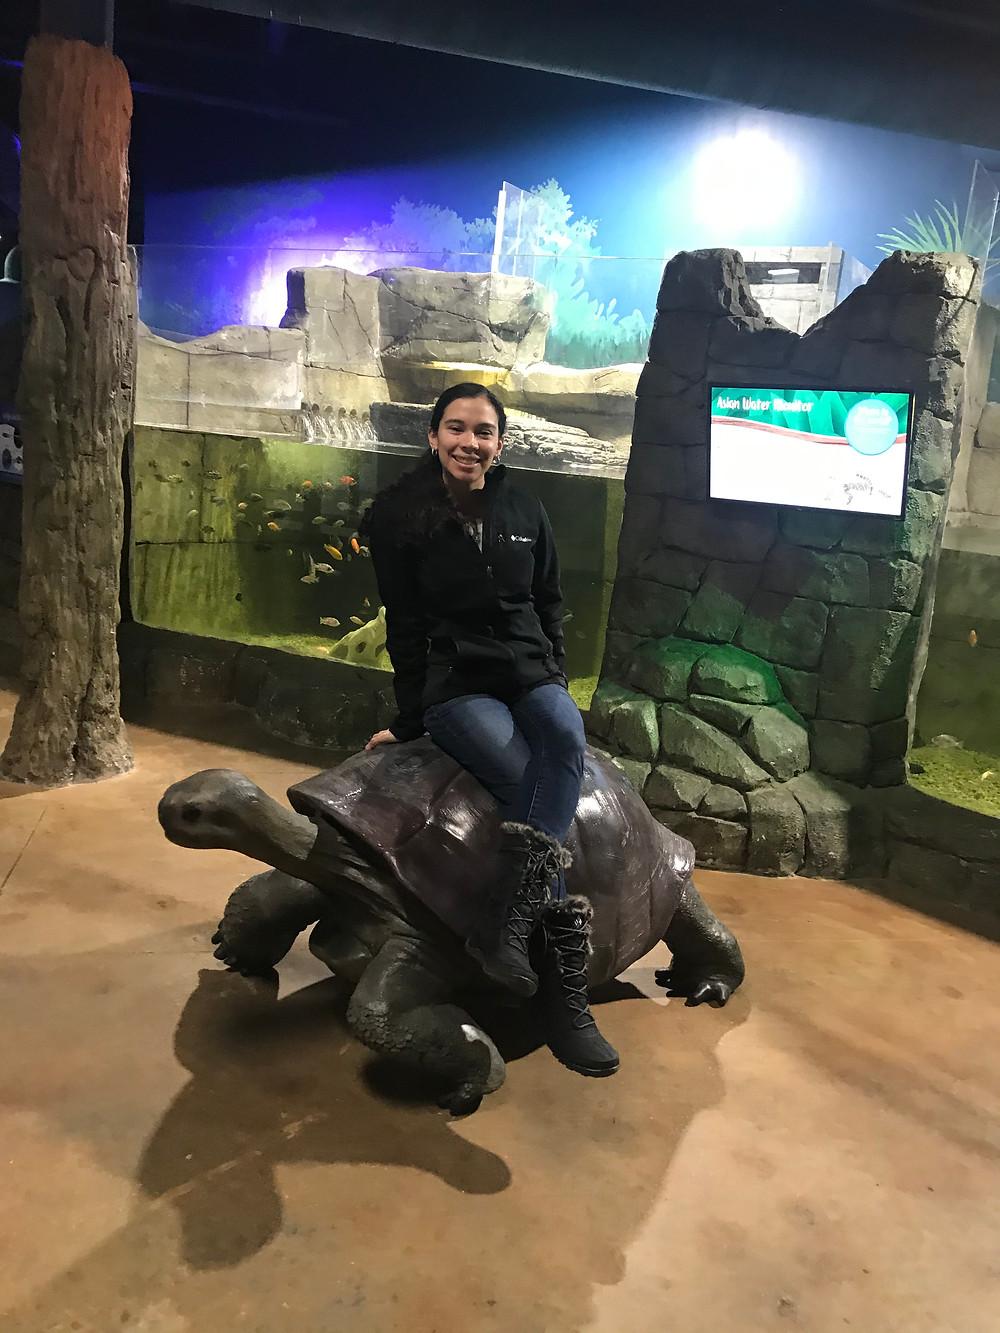 turtle, ride, slow,